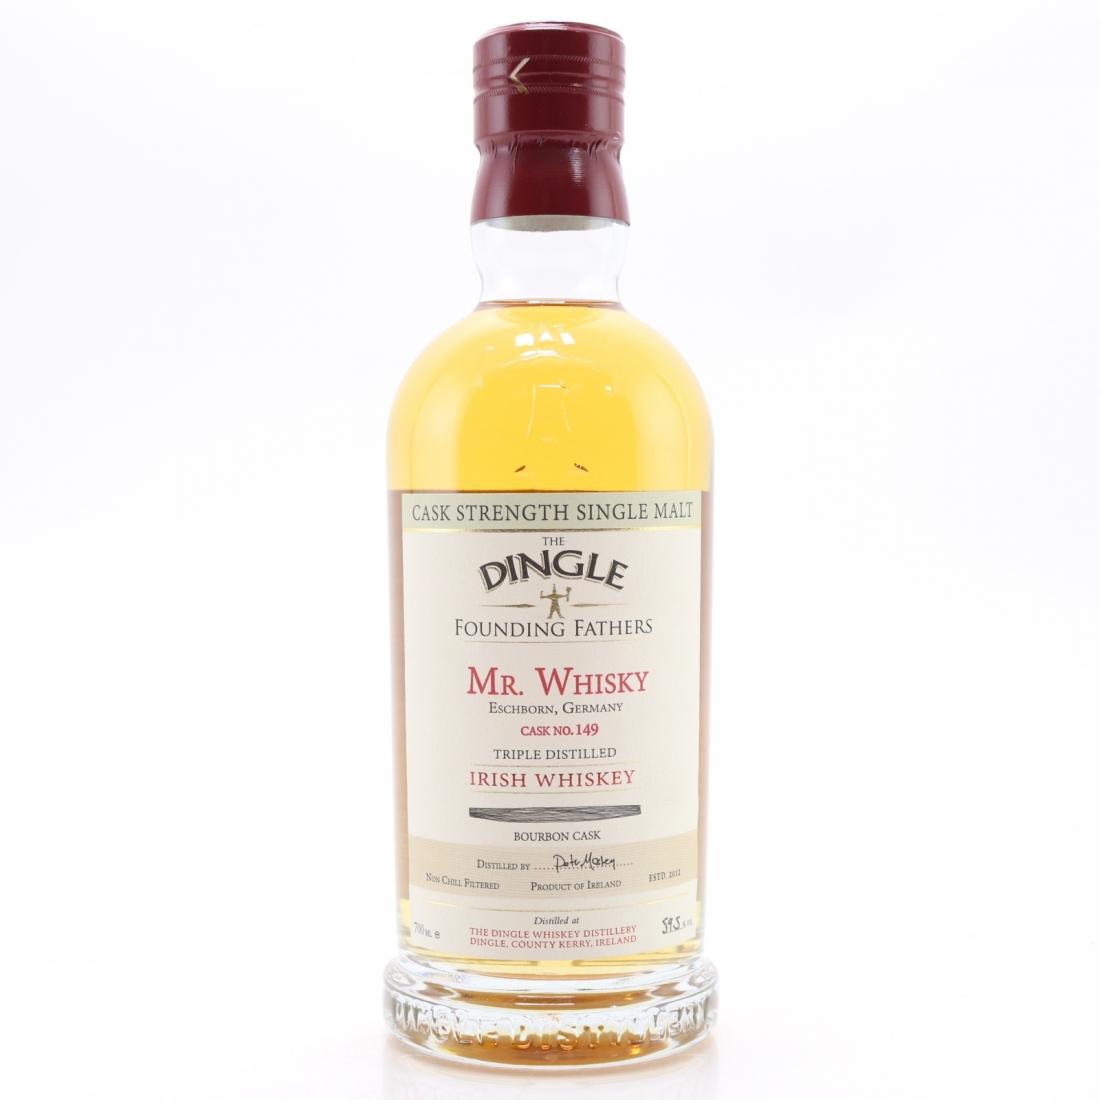 Dingle Irish Single Malt Cask Strength Founding Fathers / Mr Whisky